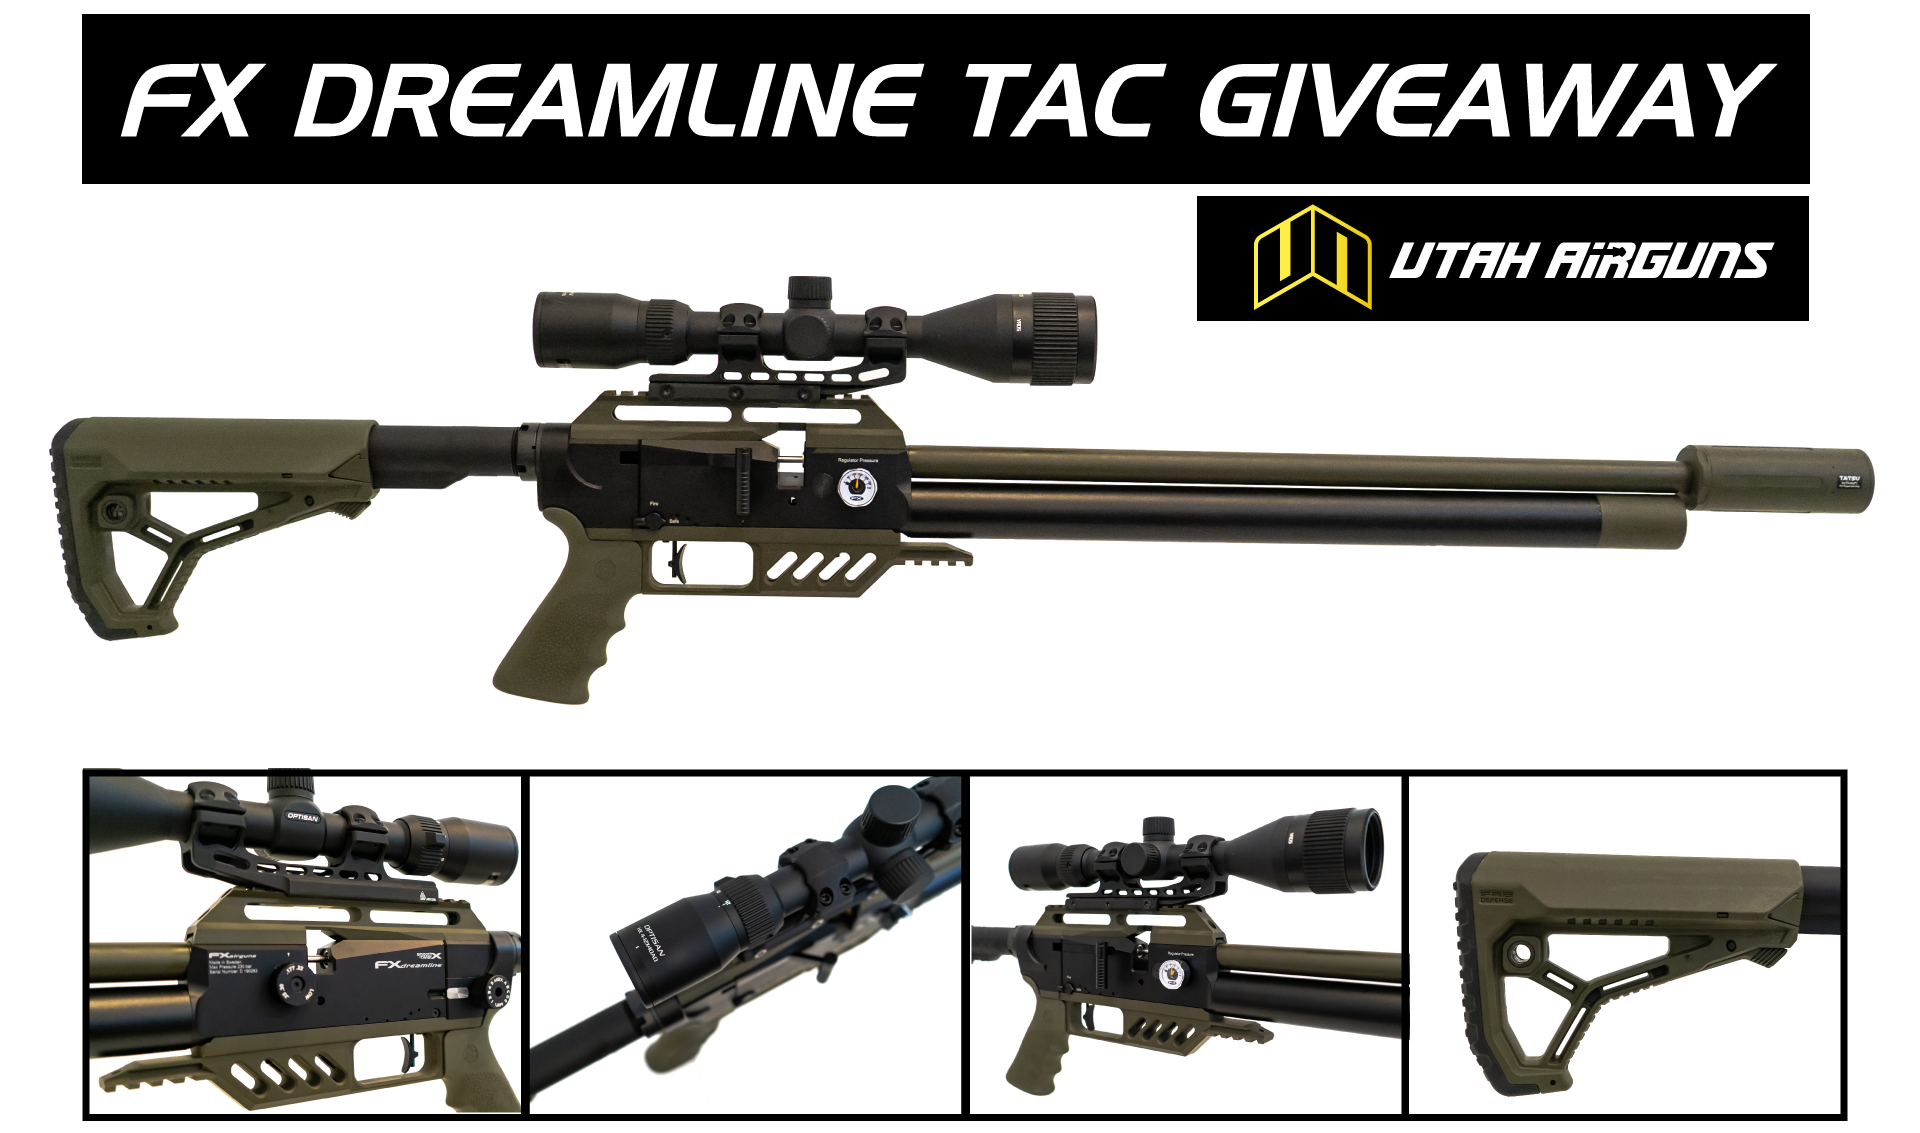 Fx Airguns Dreamline